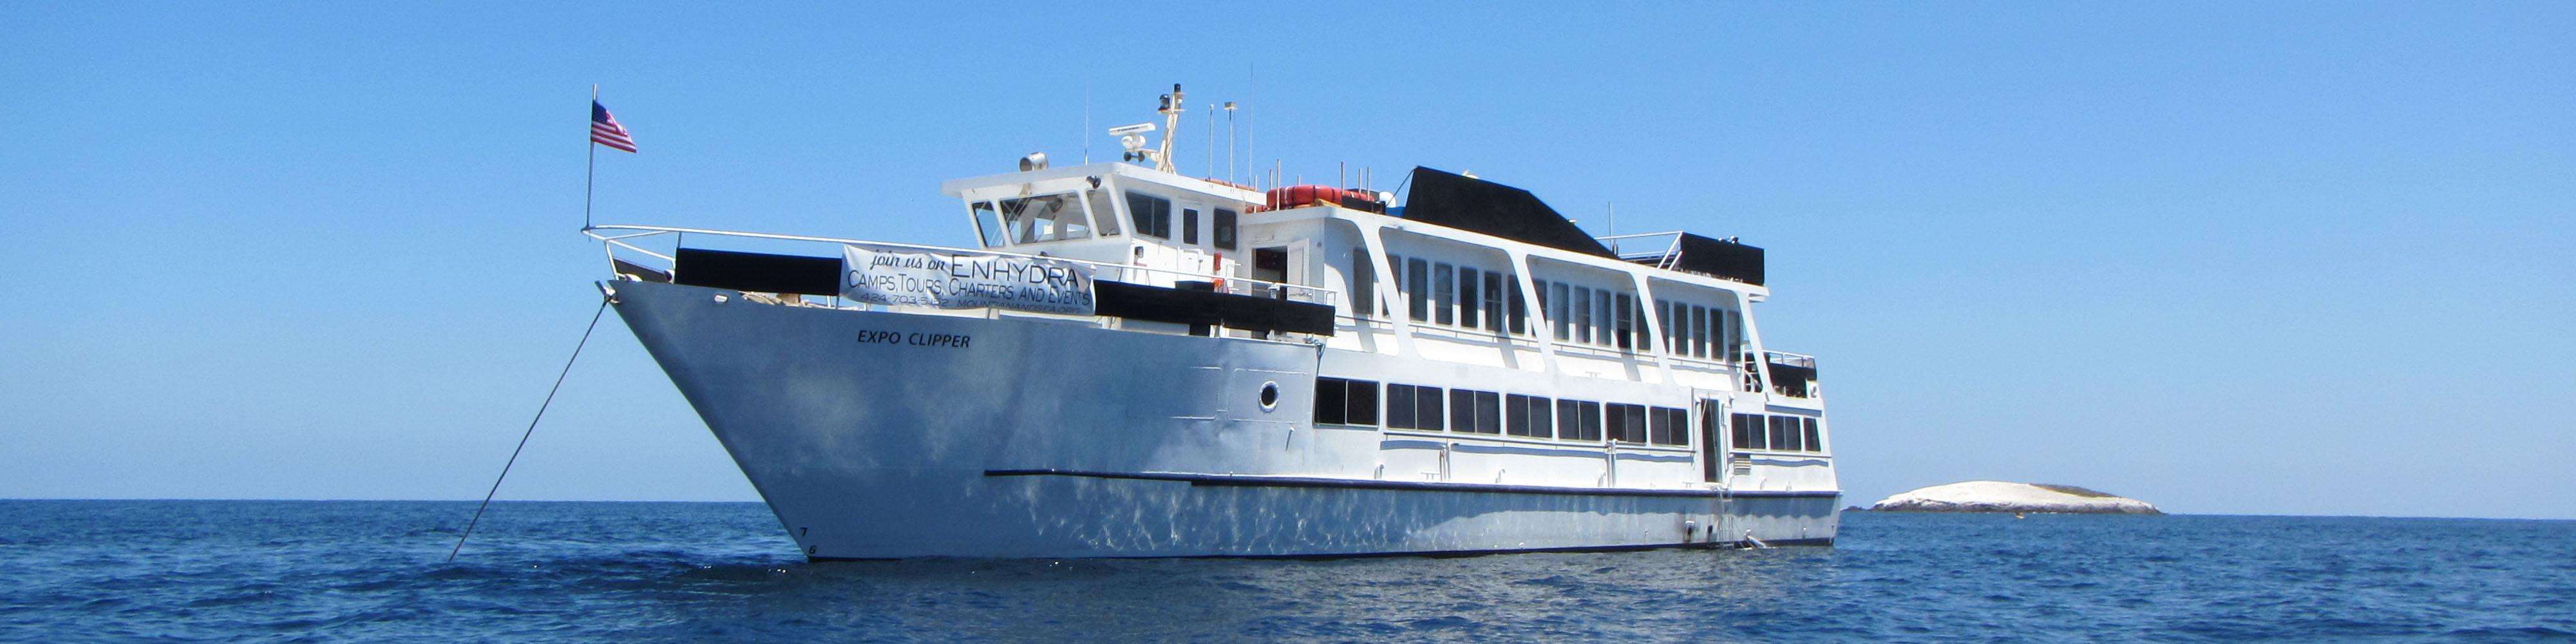 Enhydra-Luxury-Yacht-Charter